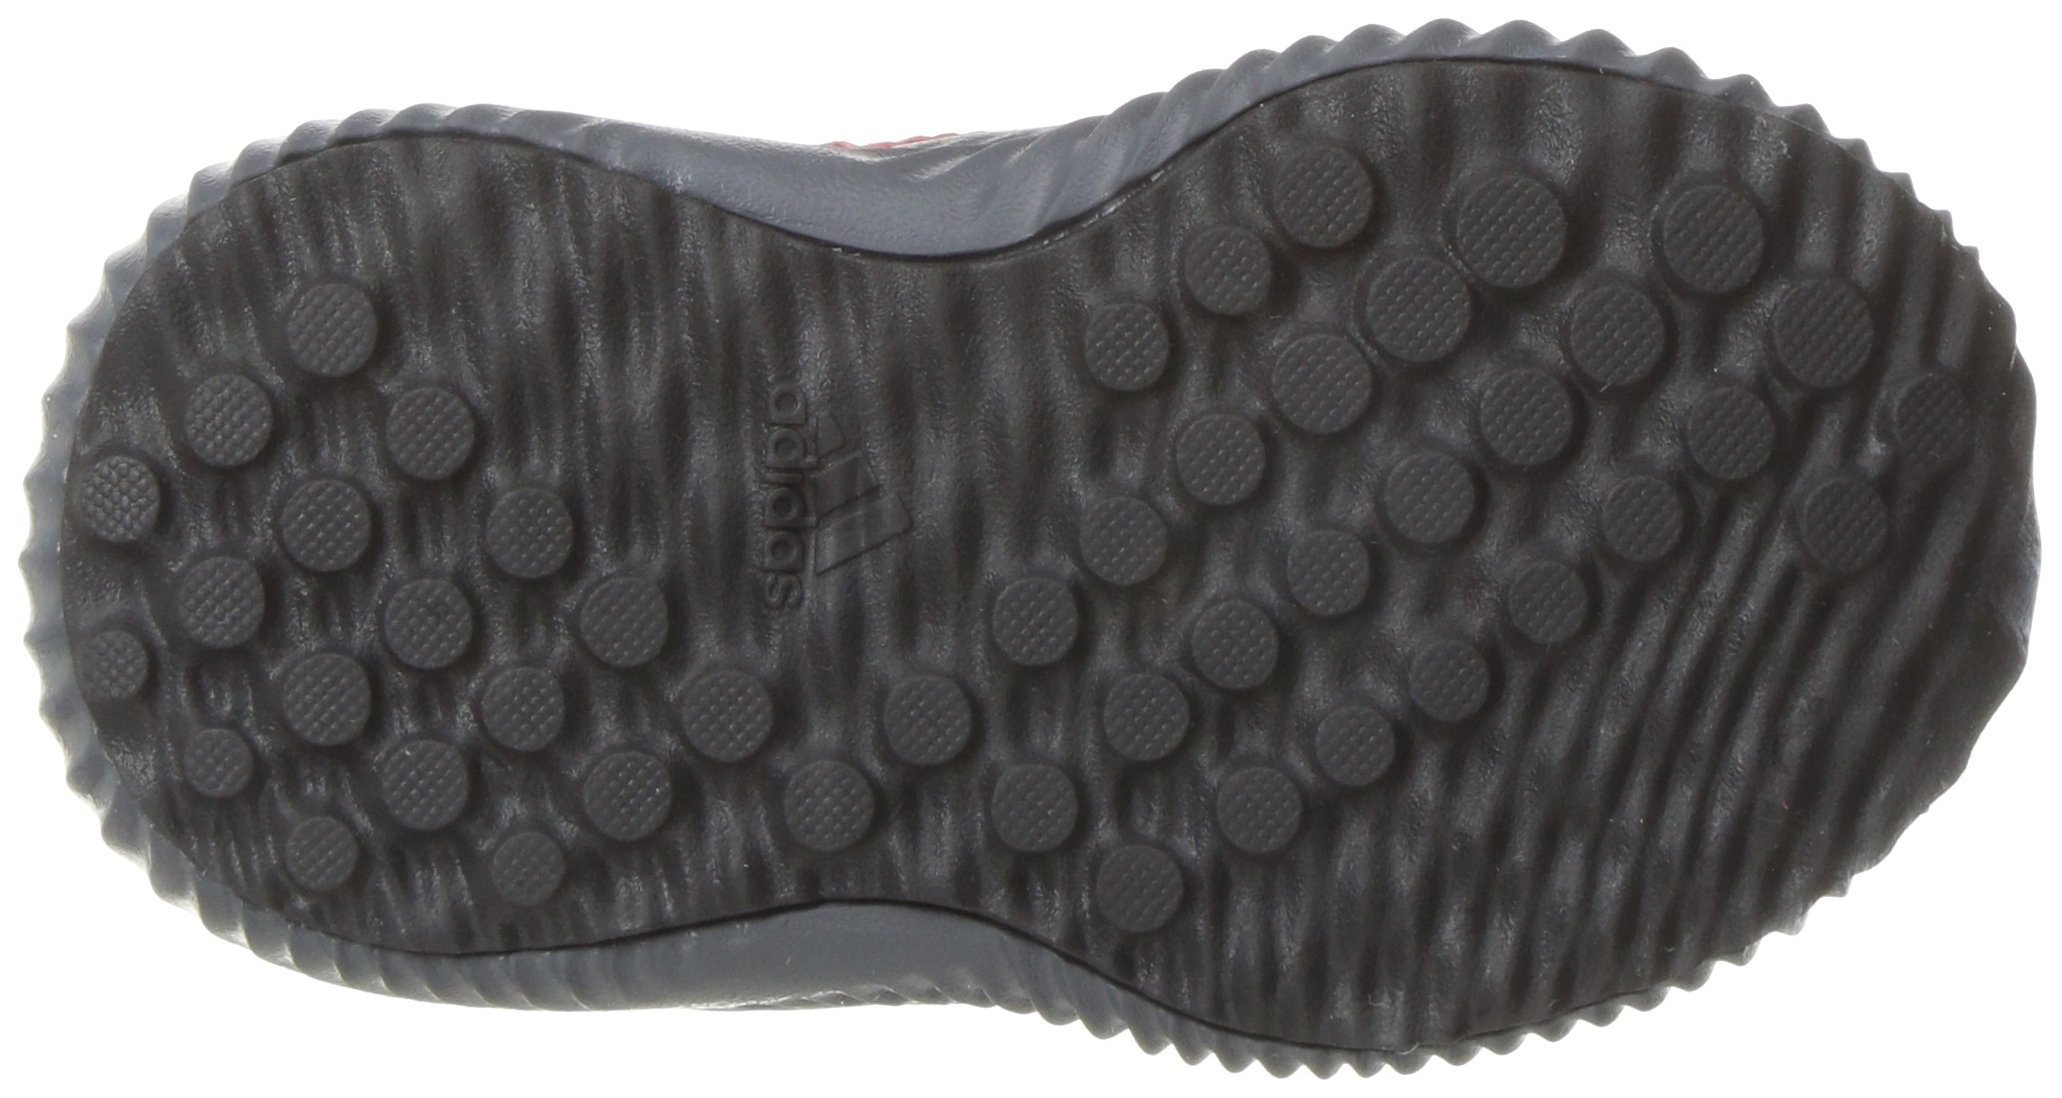 adidas Kids' Alphabounce Sneaker, Scarlet/Satellite/Black, 8 M US Toddler by adidas (Image #3)